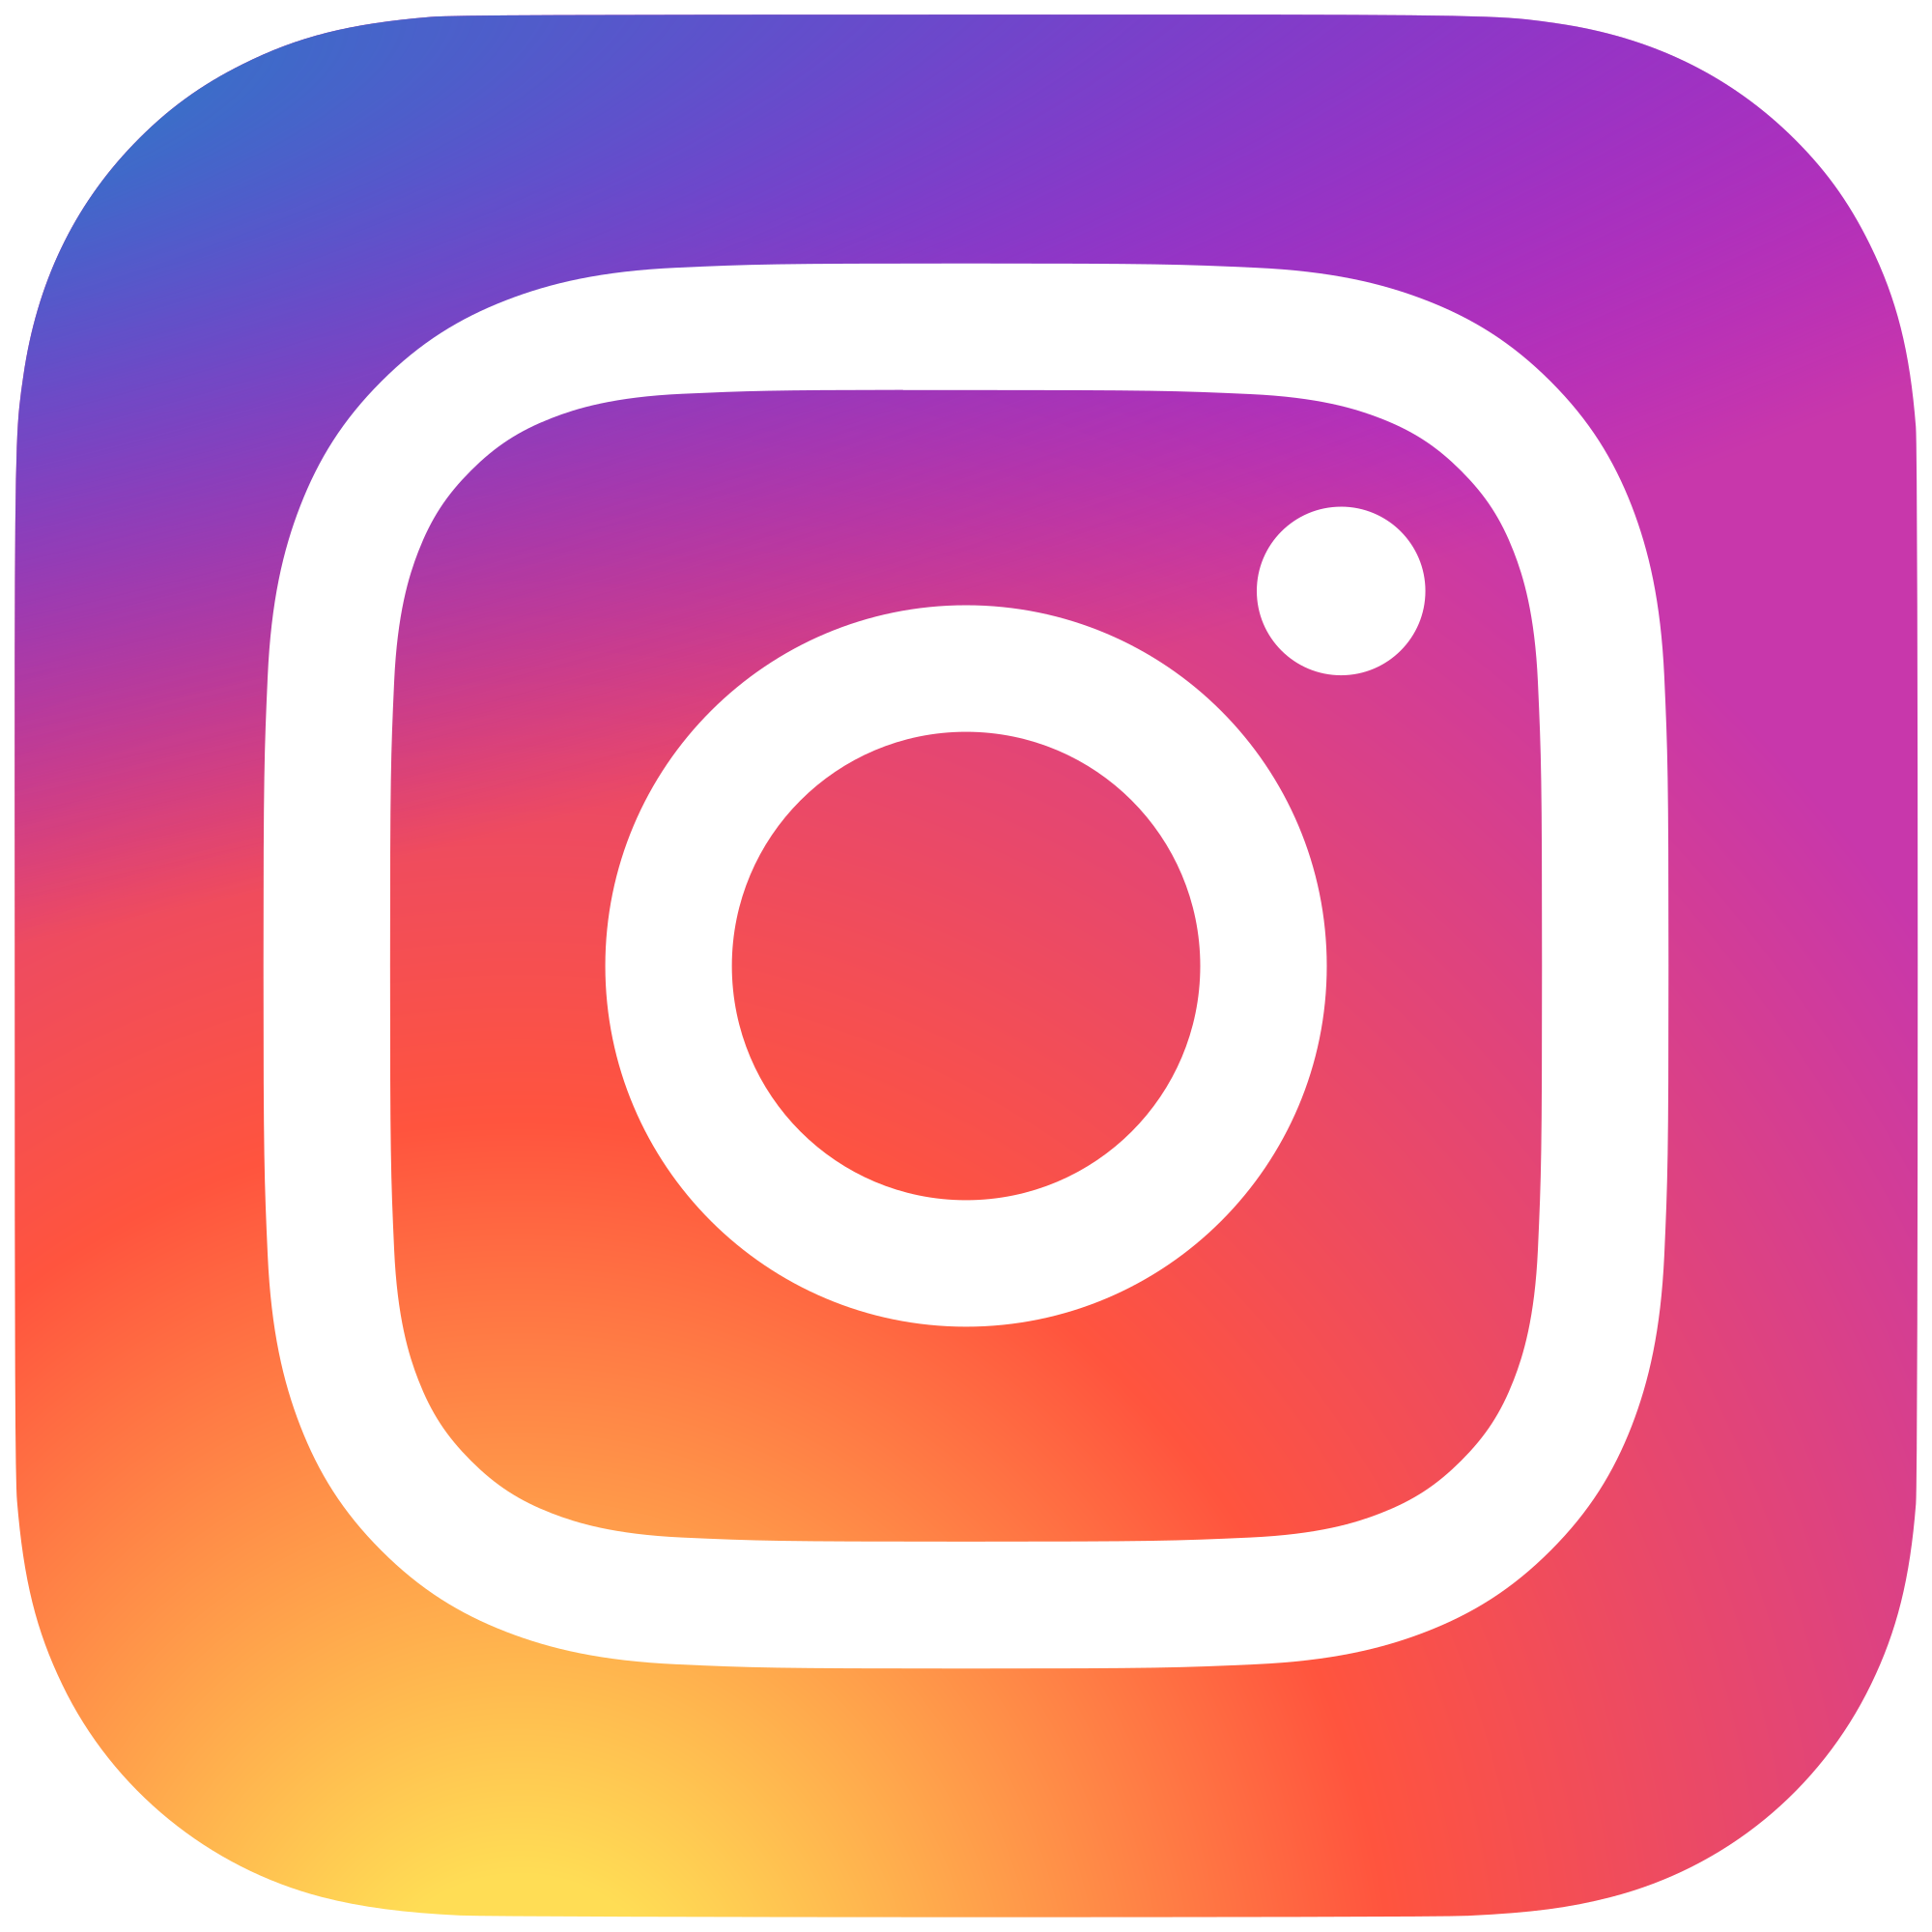 instagram logo - Главная